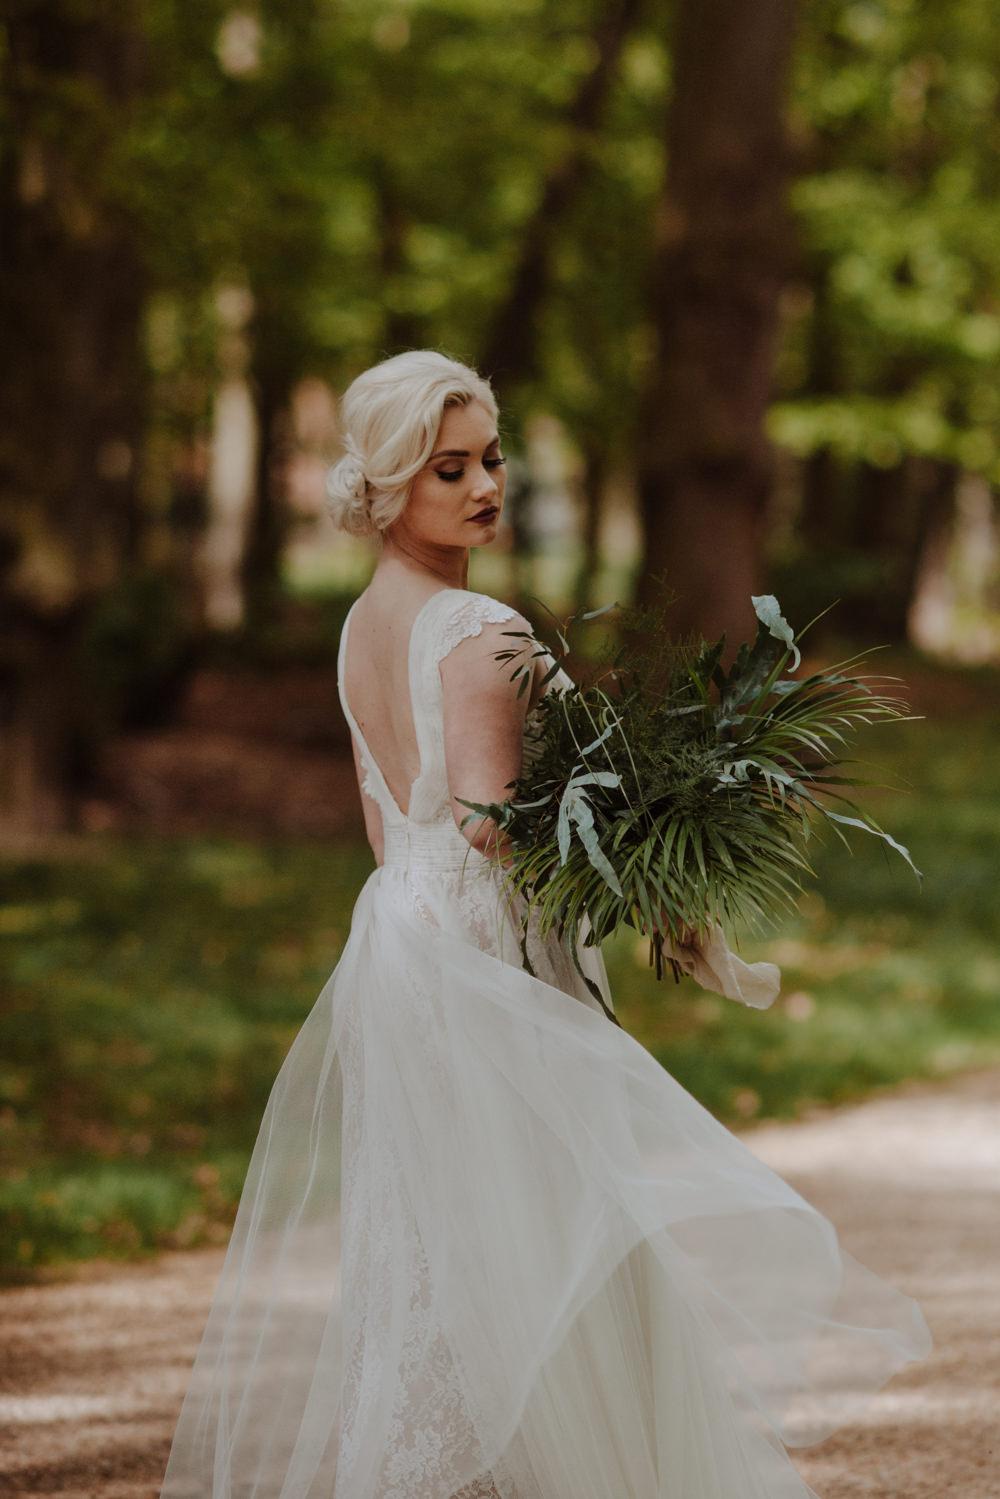 Bride Bridal Dress Gown Lace V Back A Line Greenery Foliage Bouquet Organic Foliage Wedding Ideas Rubie Love Photography